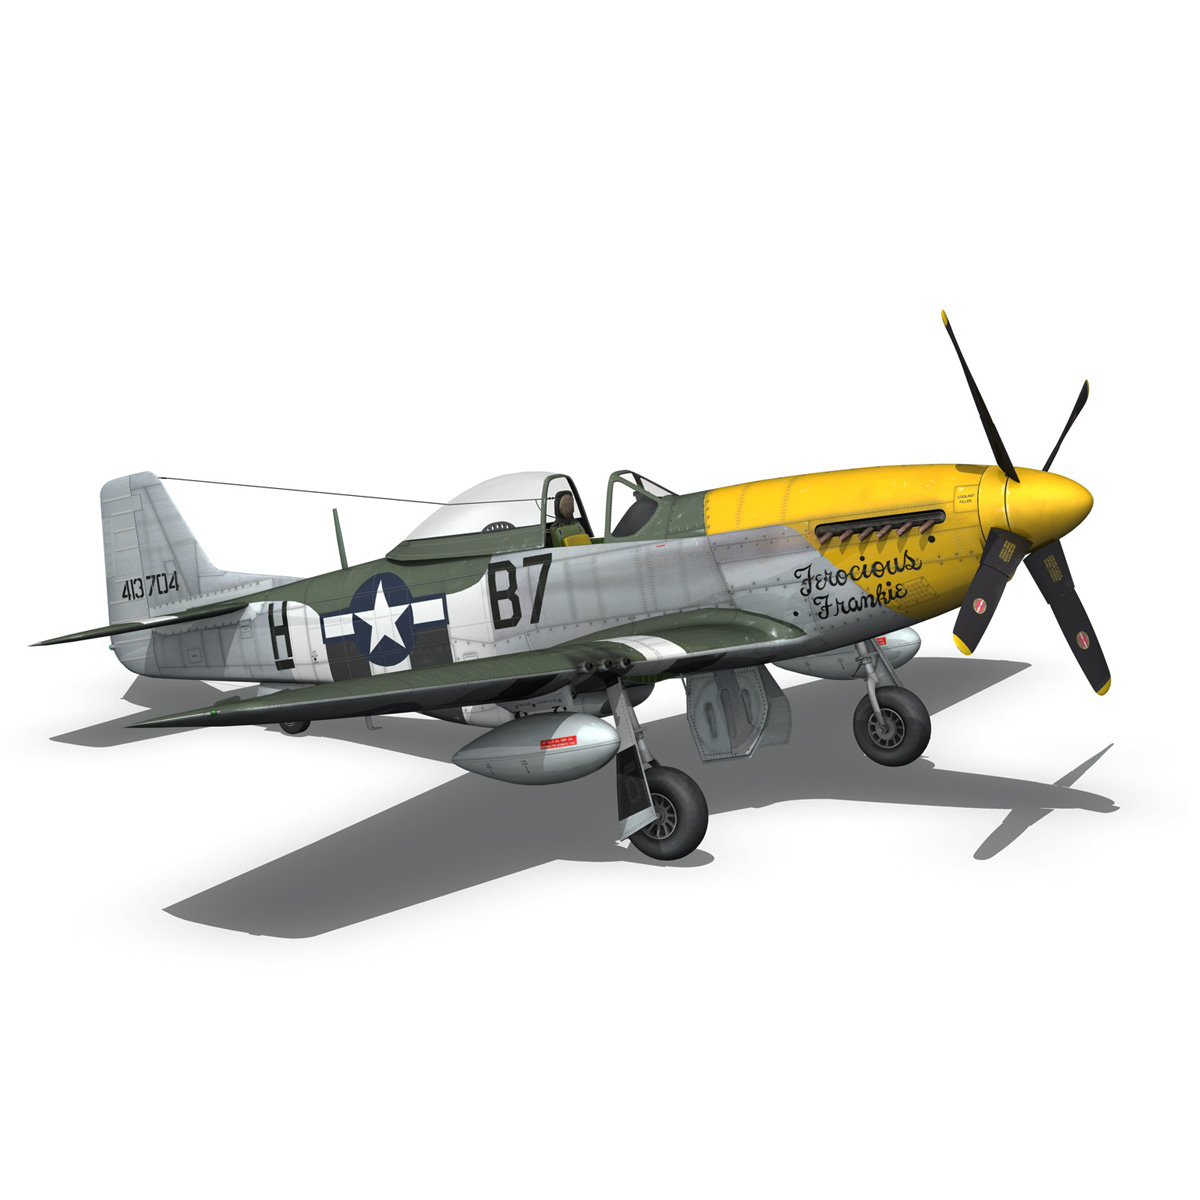 north american p-51d mustang – ferocious frankie 3d model fbx c4d lwo obj 269499